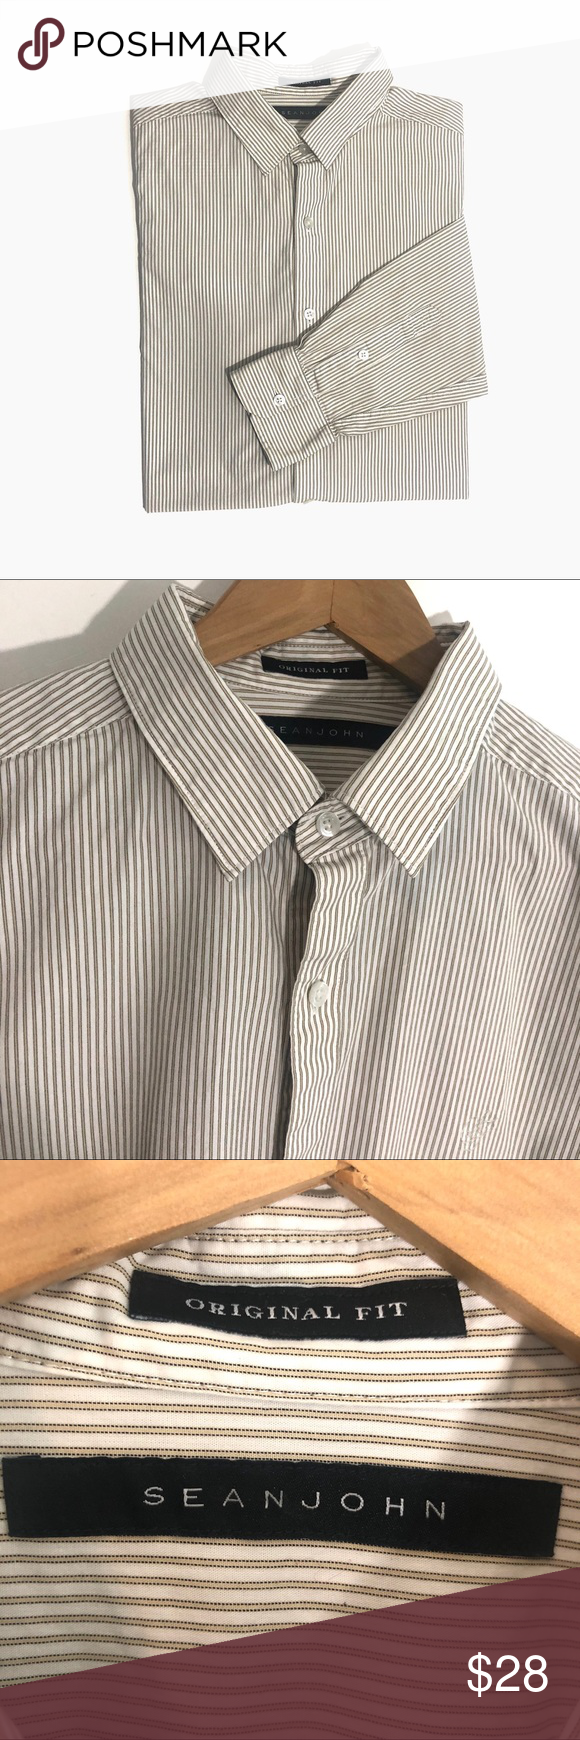 Sean John Original Fit Large Striped Dress Shirt Monogram Dress Shirt Shirt Dress Monogrammed Dress [ 1740 x 580 Pixel ]